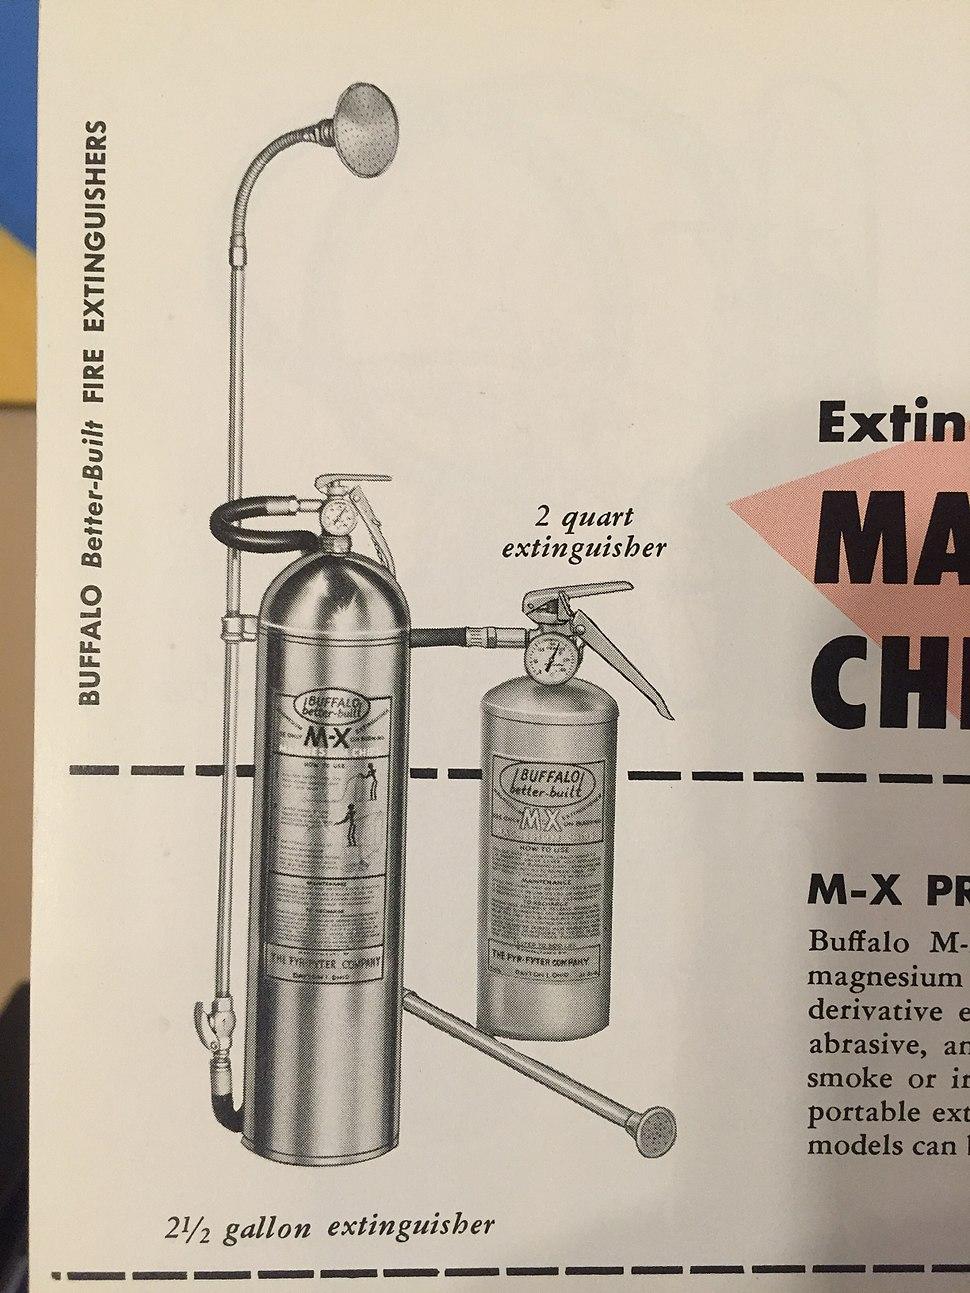 Buffalo M-X Fire extinguishers